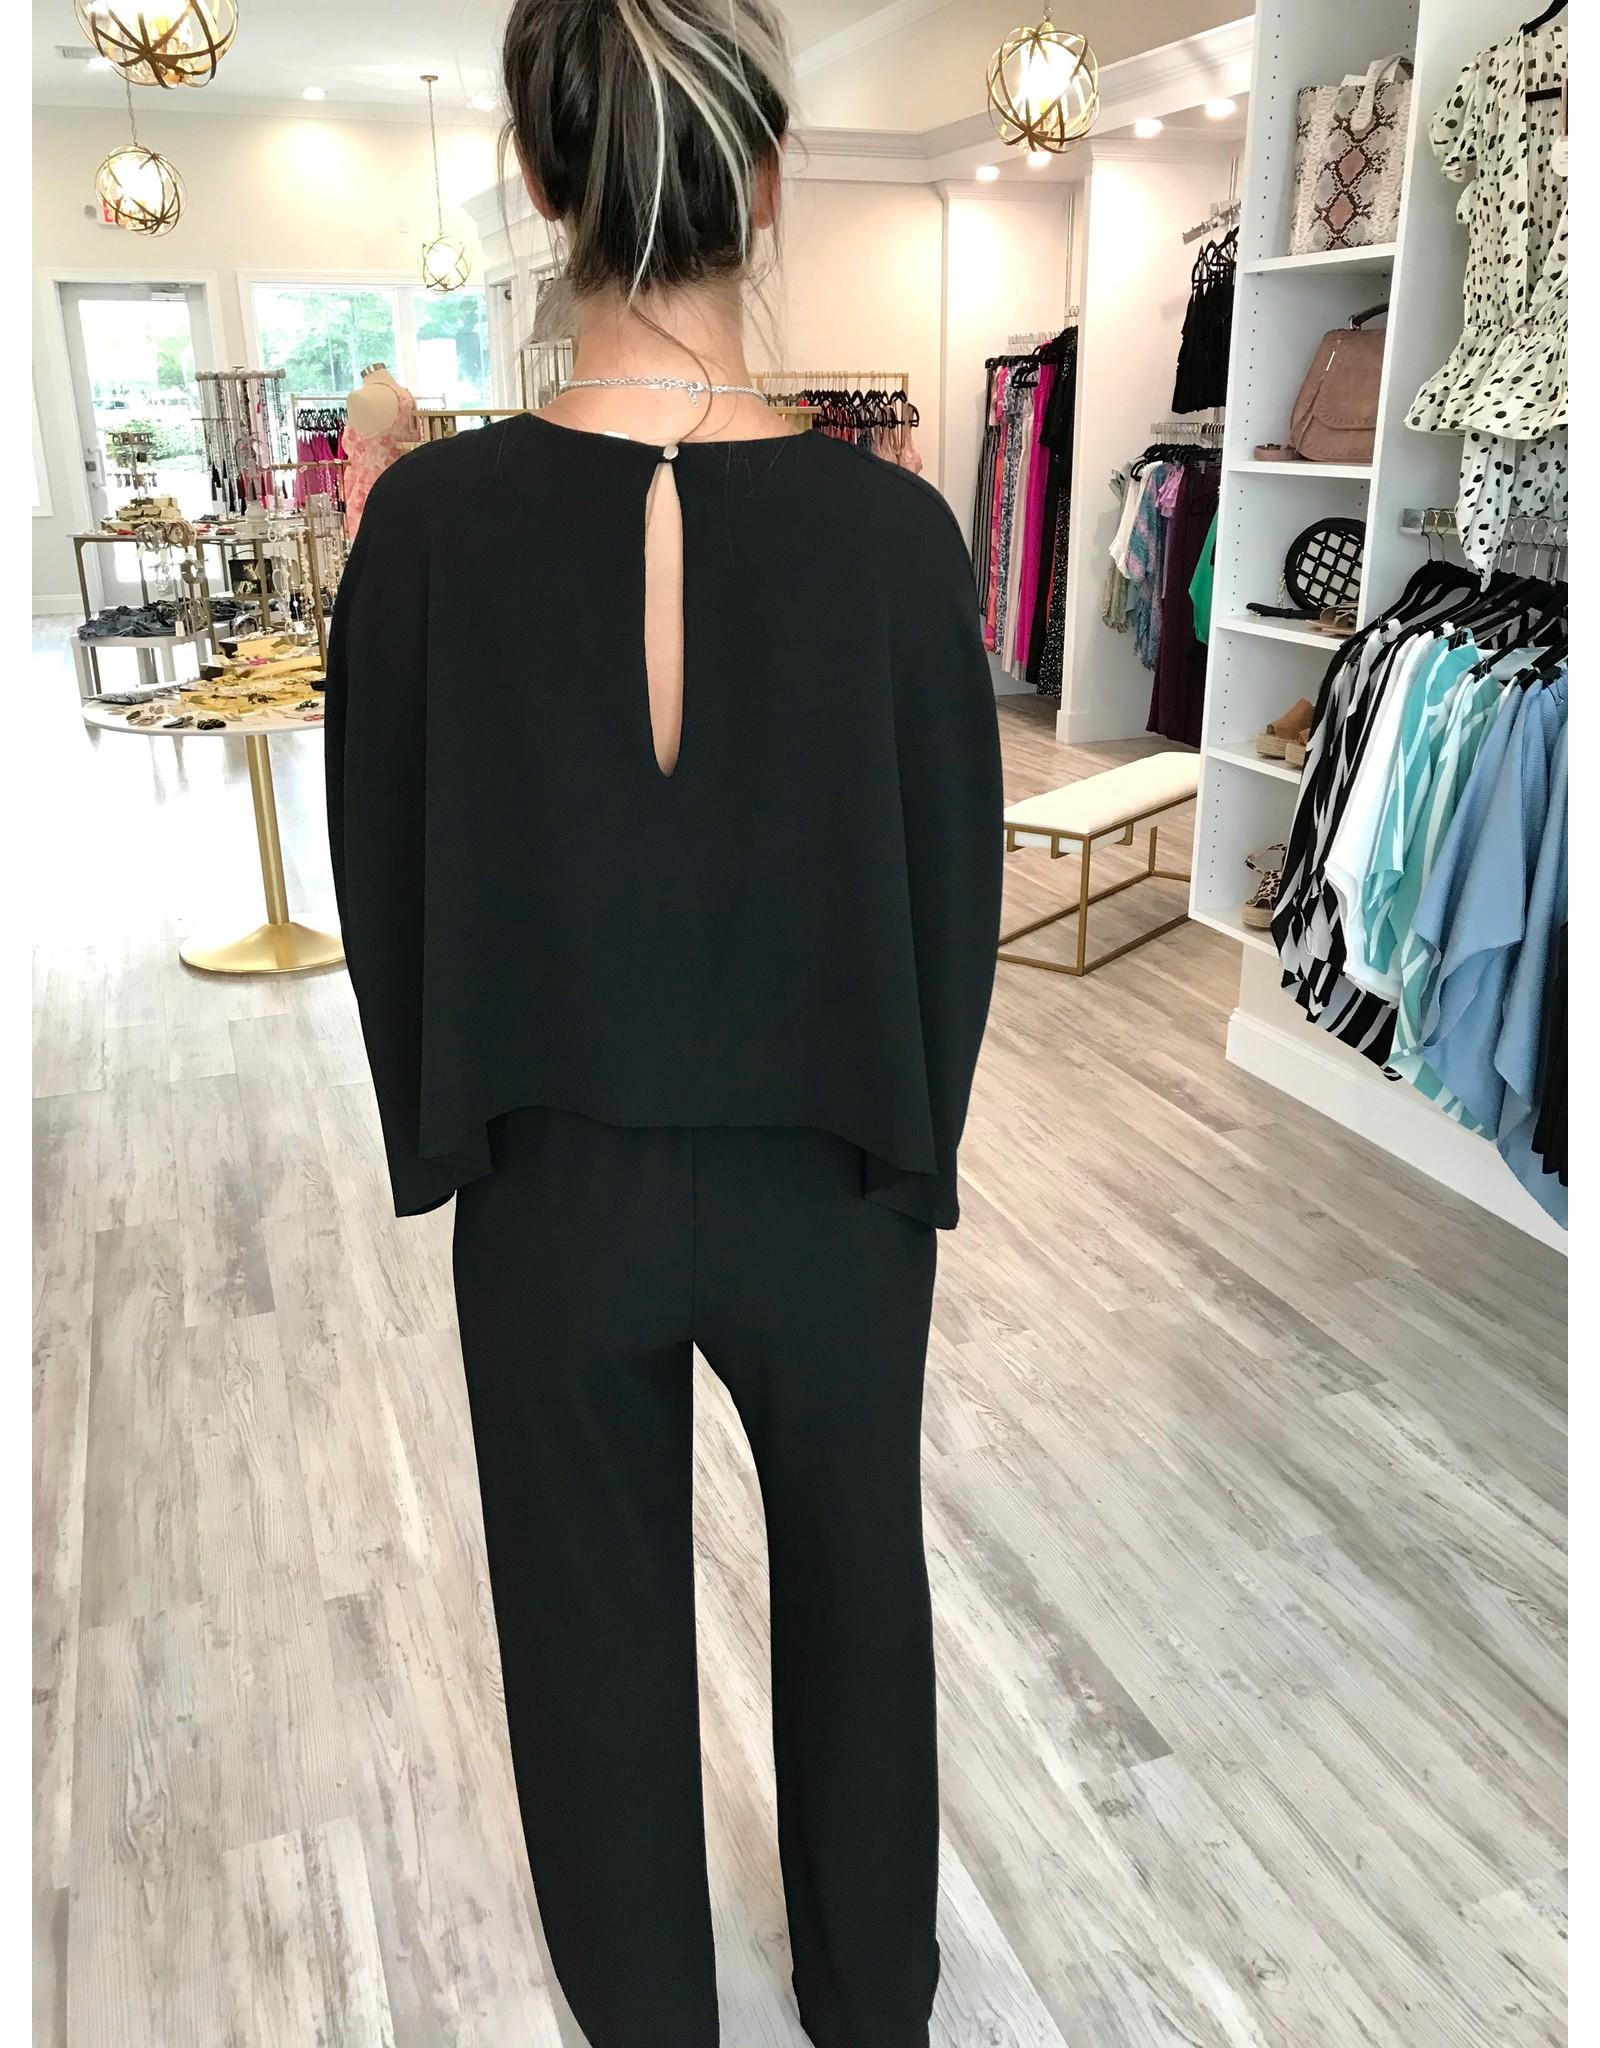 Kimono Jumpsuit - Black